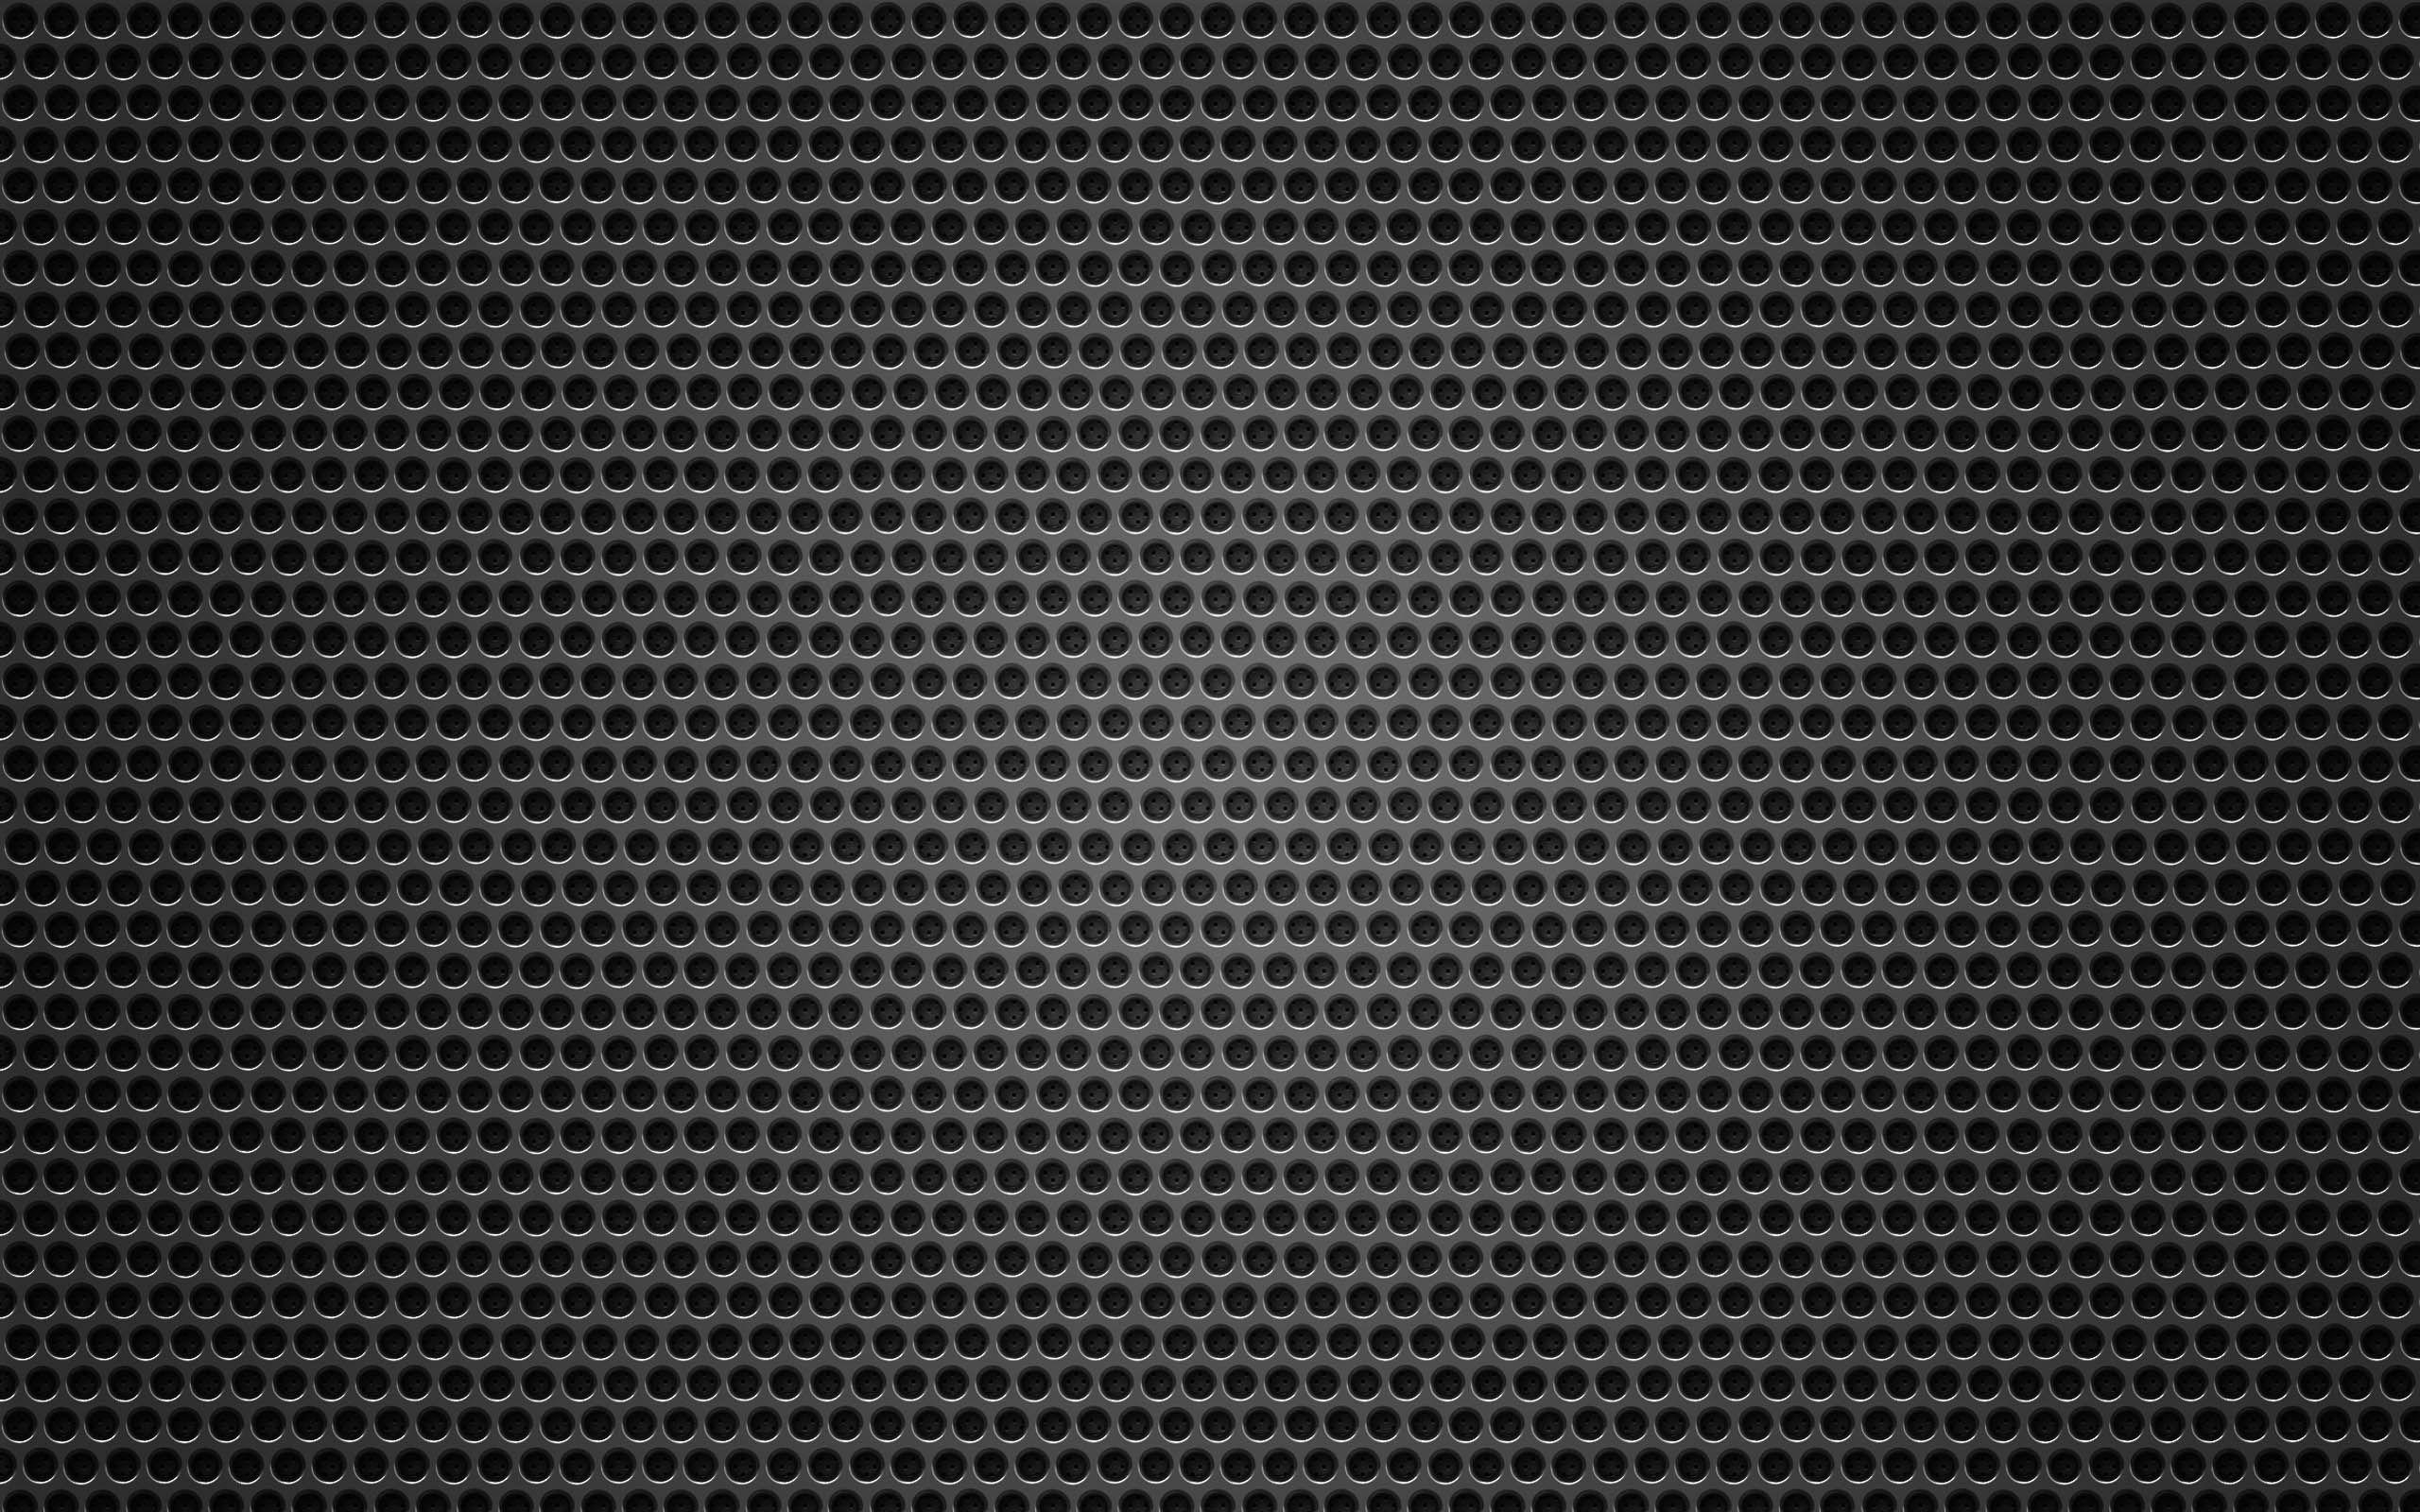 Black Wallpapers High Resolution: Black Background High Resolution #6355 Wallpaper